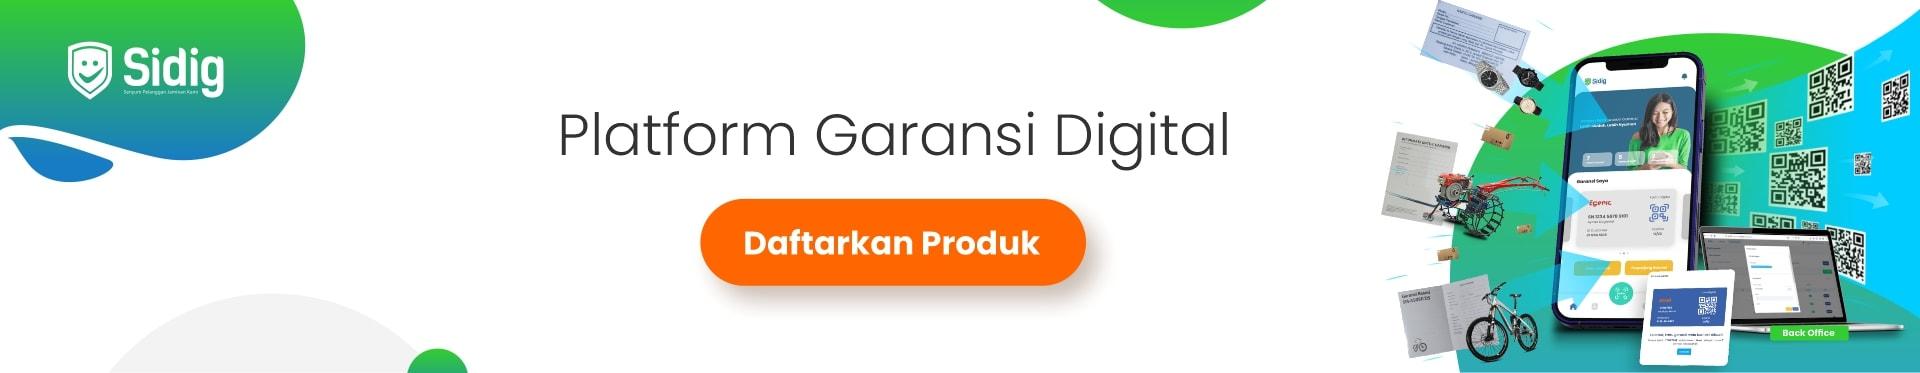 garansi digital